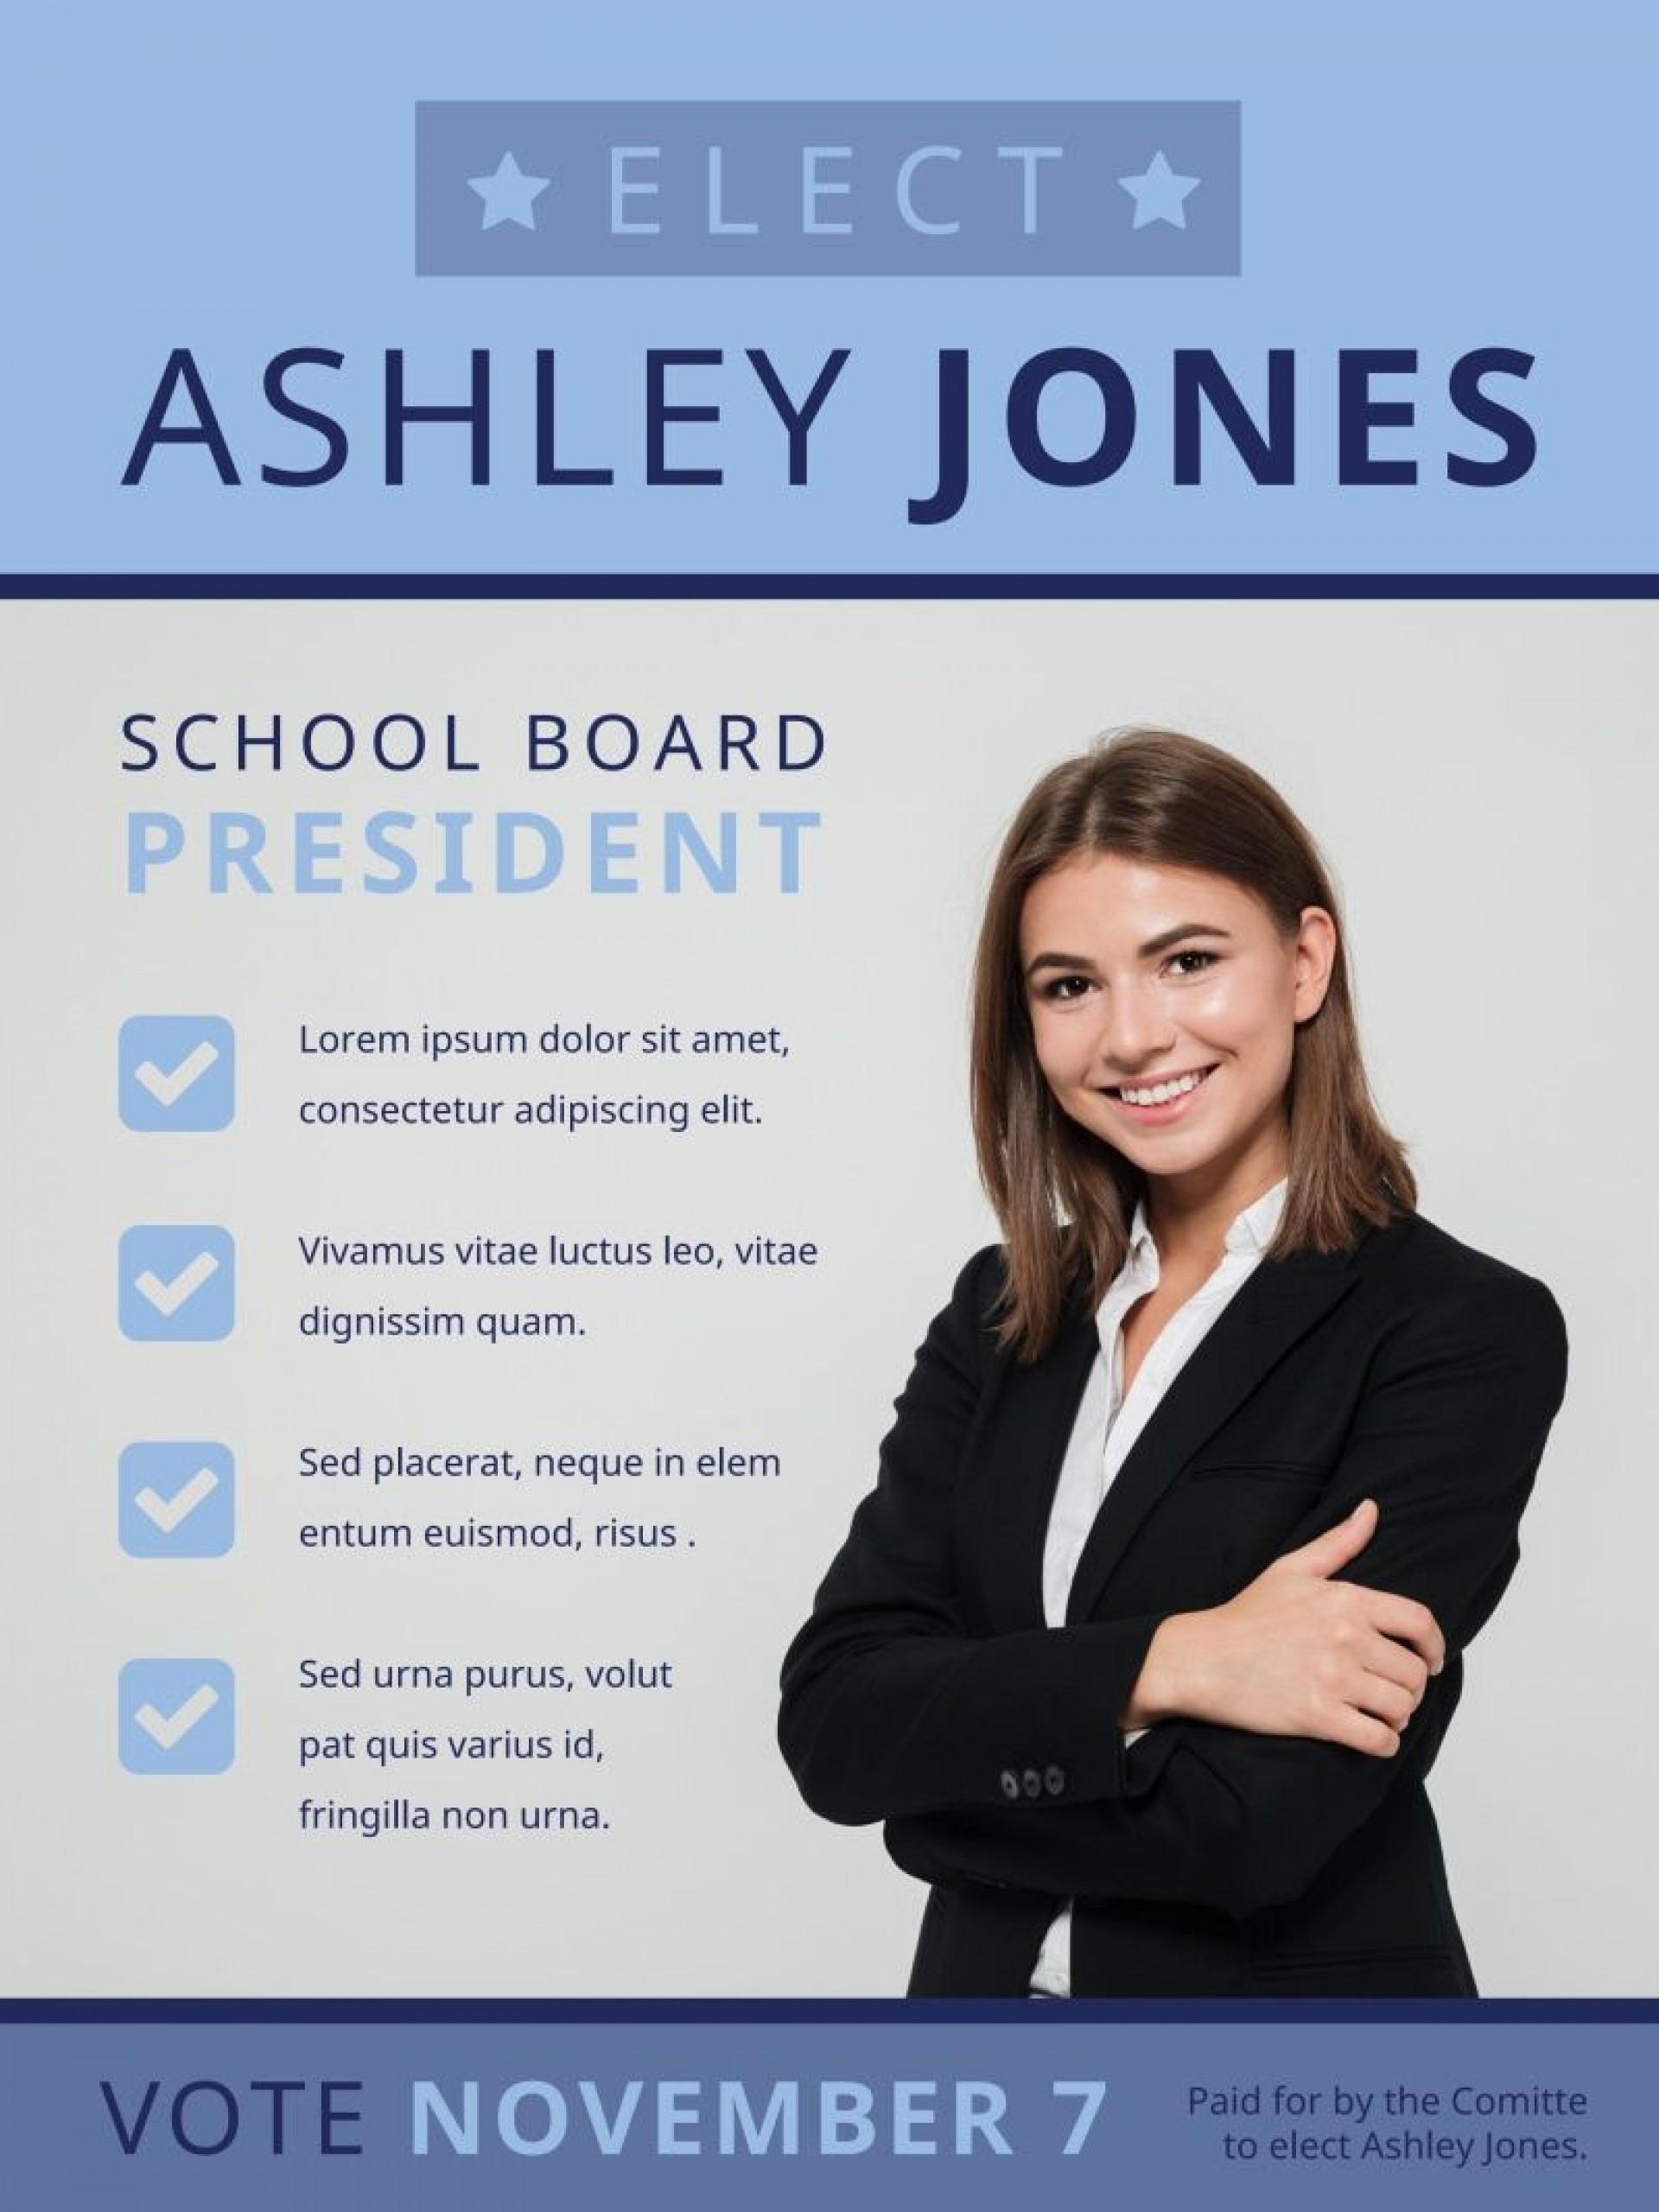 007 Excellent Online Campaign Poster Maker Free Sample  Election1920